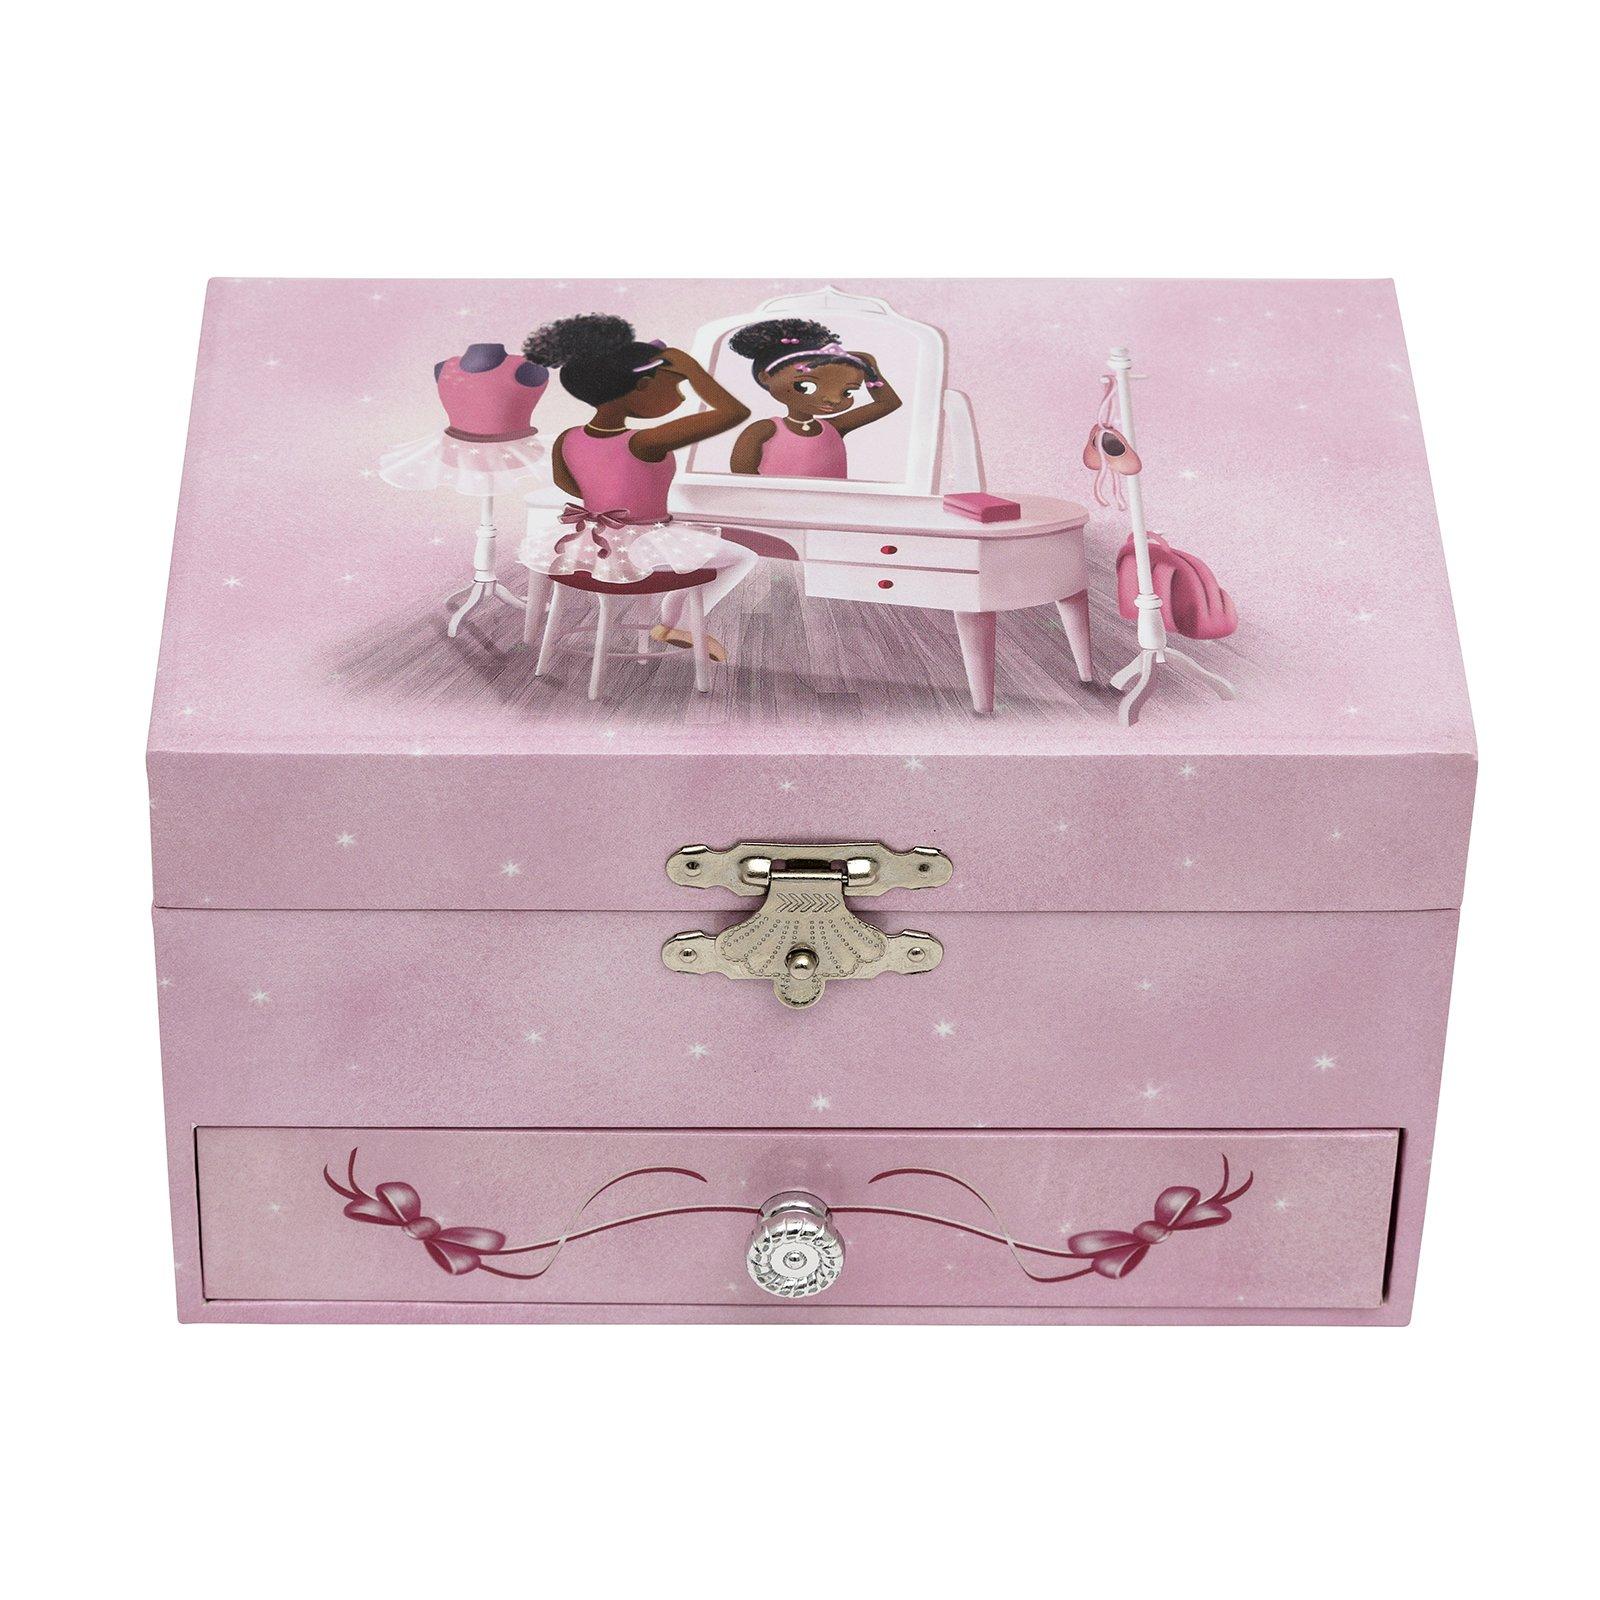 Nia Ballerina Musical Jewelry Box - Dressing Table